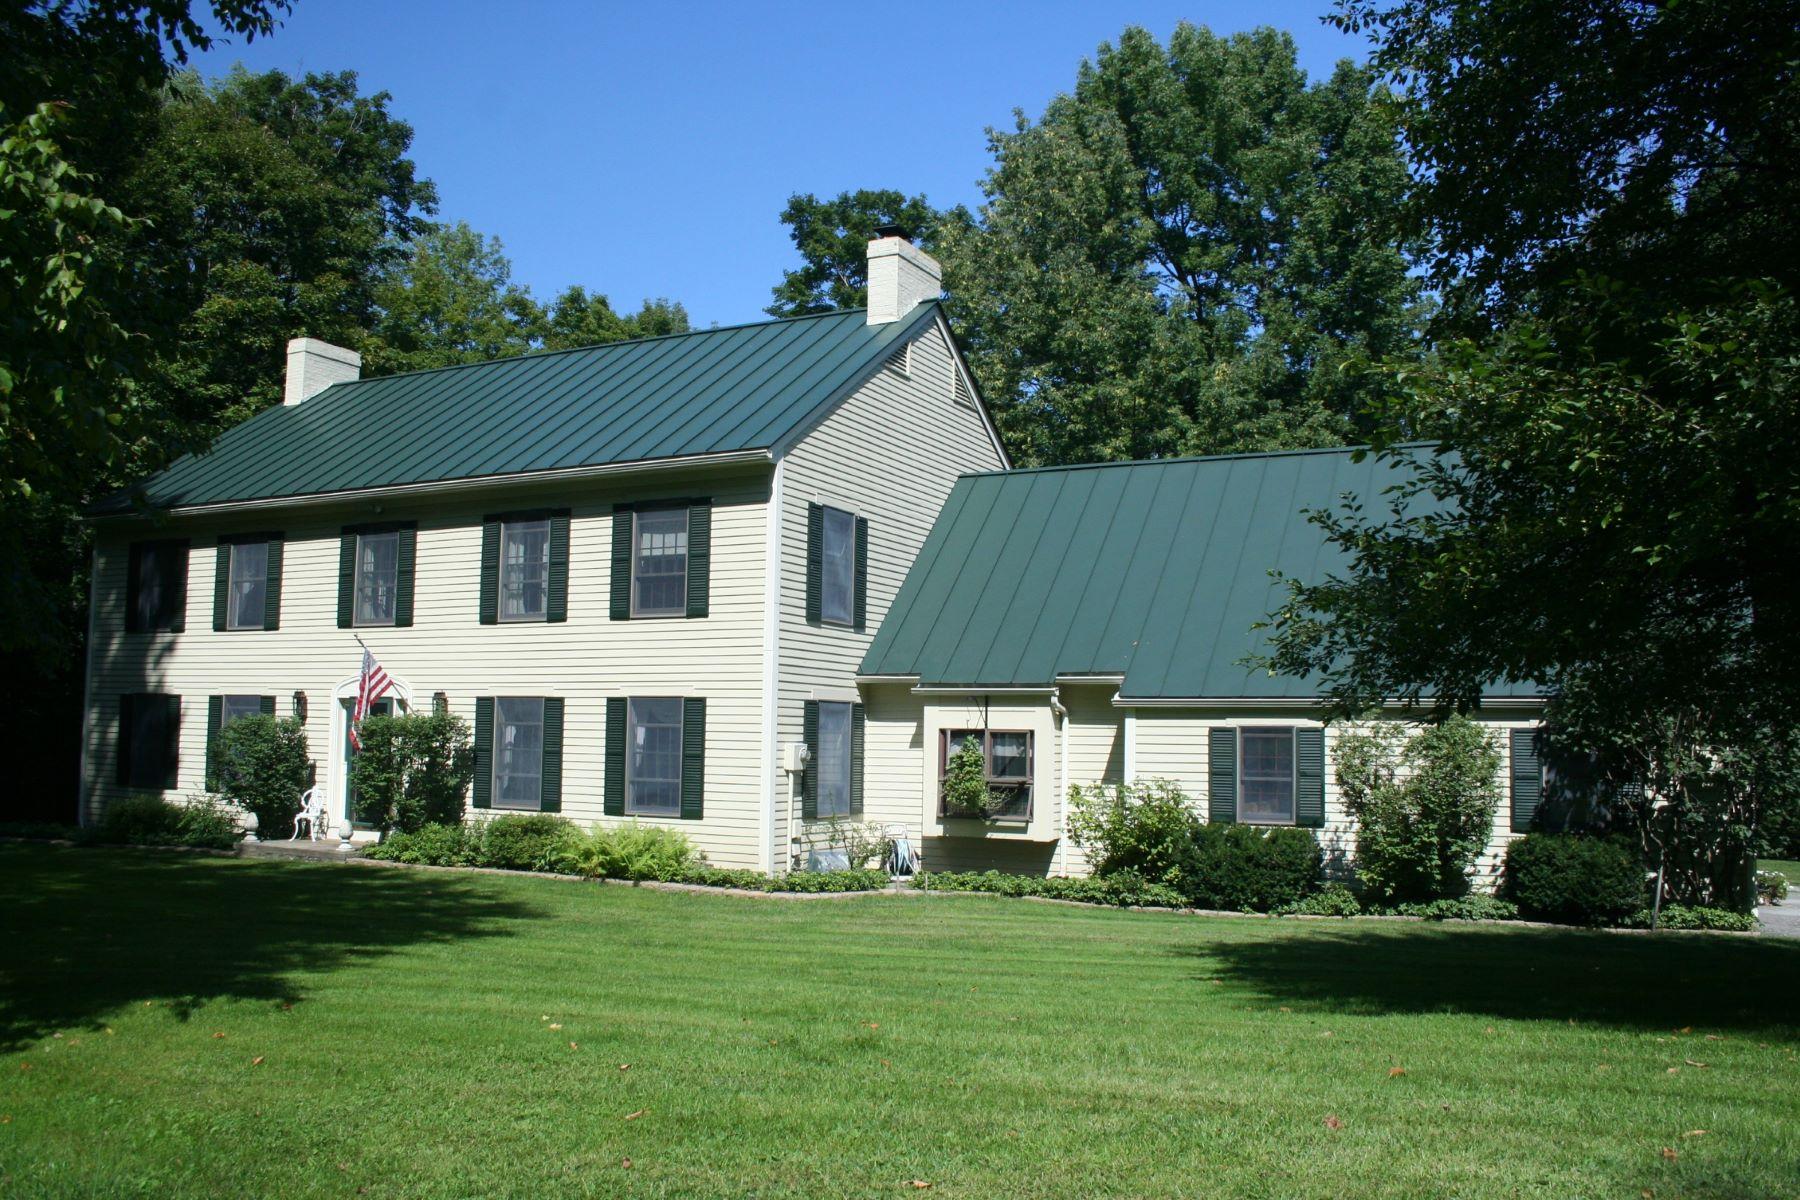 独户住宅 为 销售 在 Fifteen minutes to Medical Center 18 Montview Dr 汉诺威市, 新罕布什尔州, 03755 美国